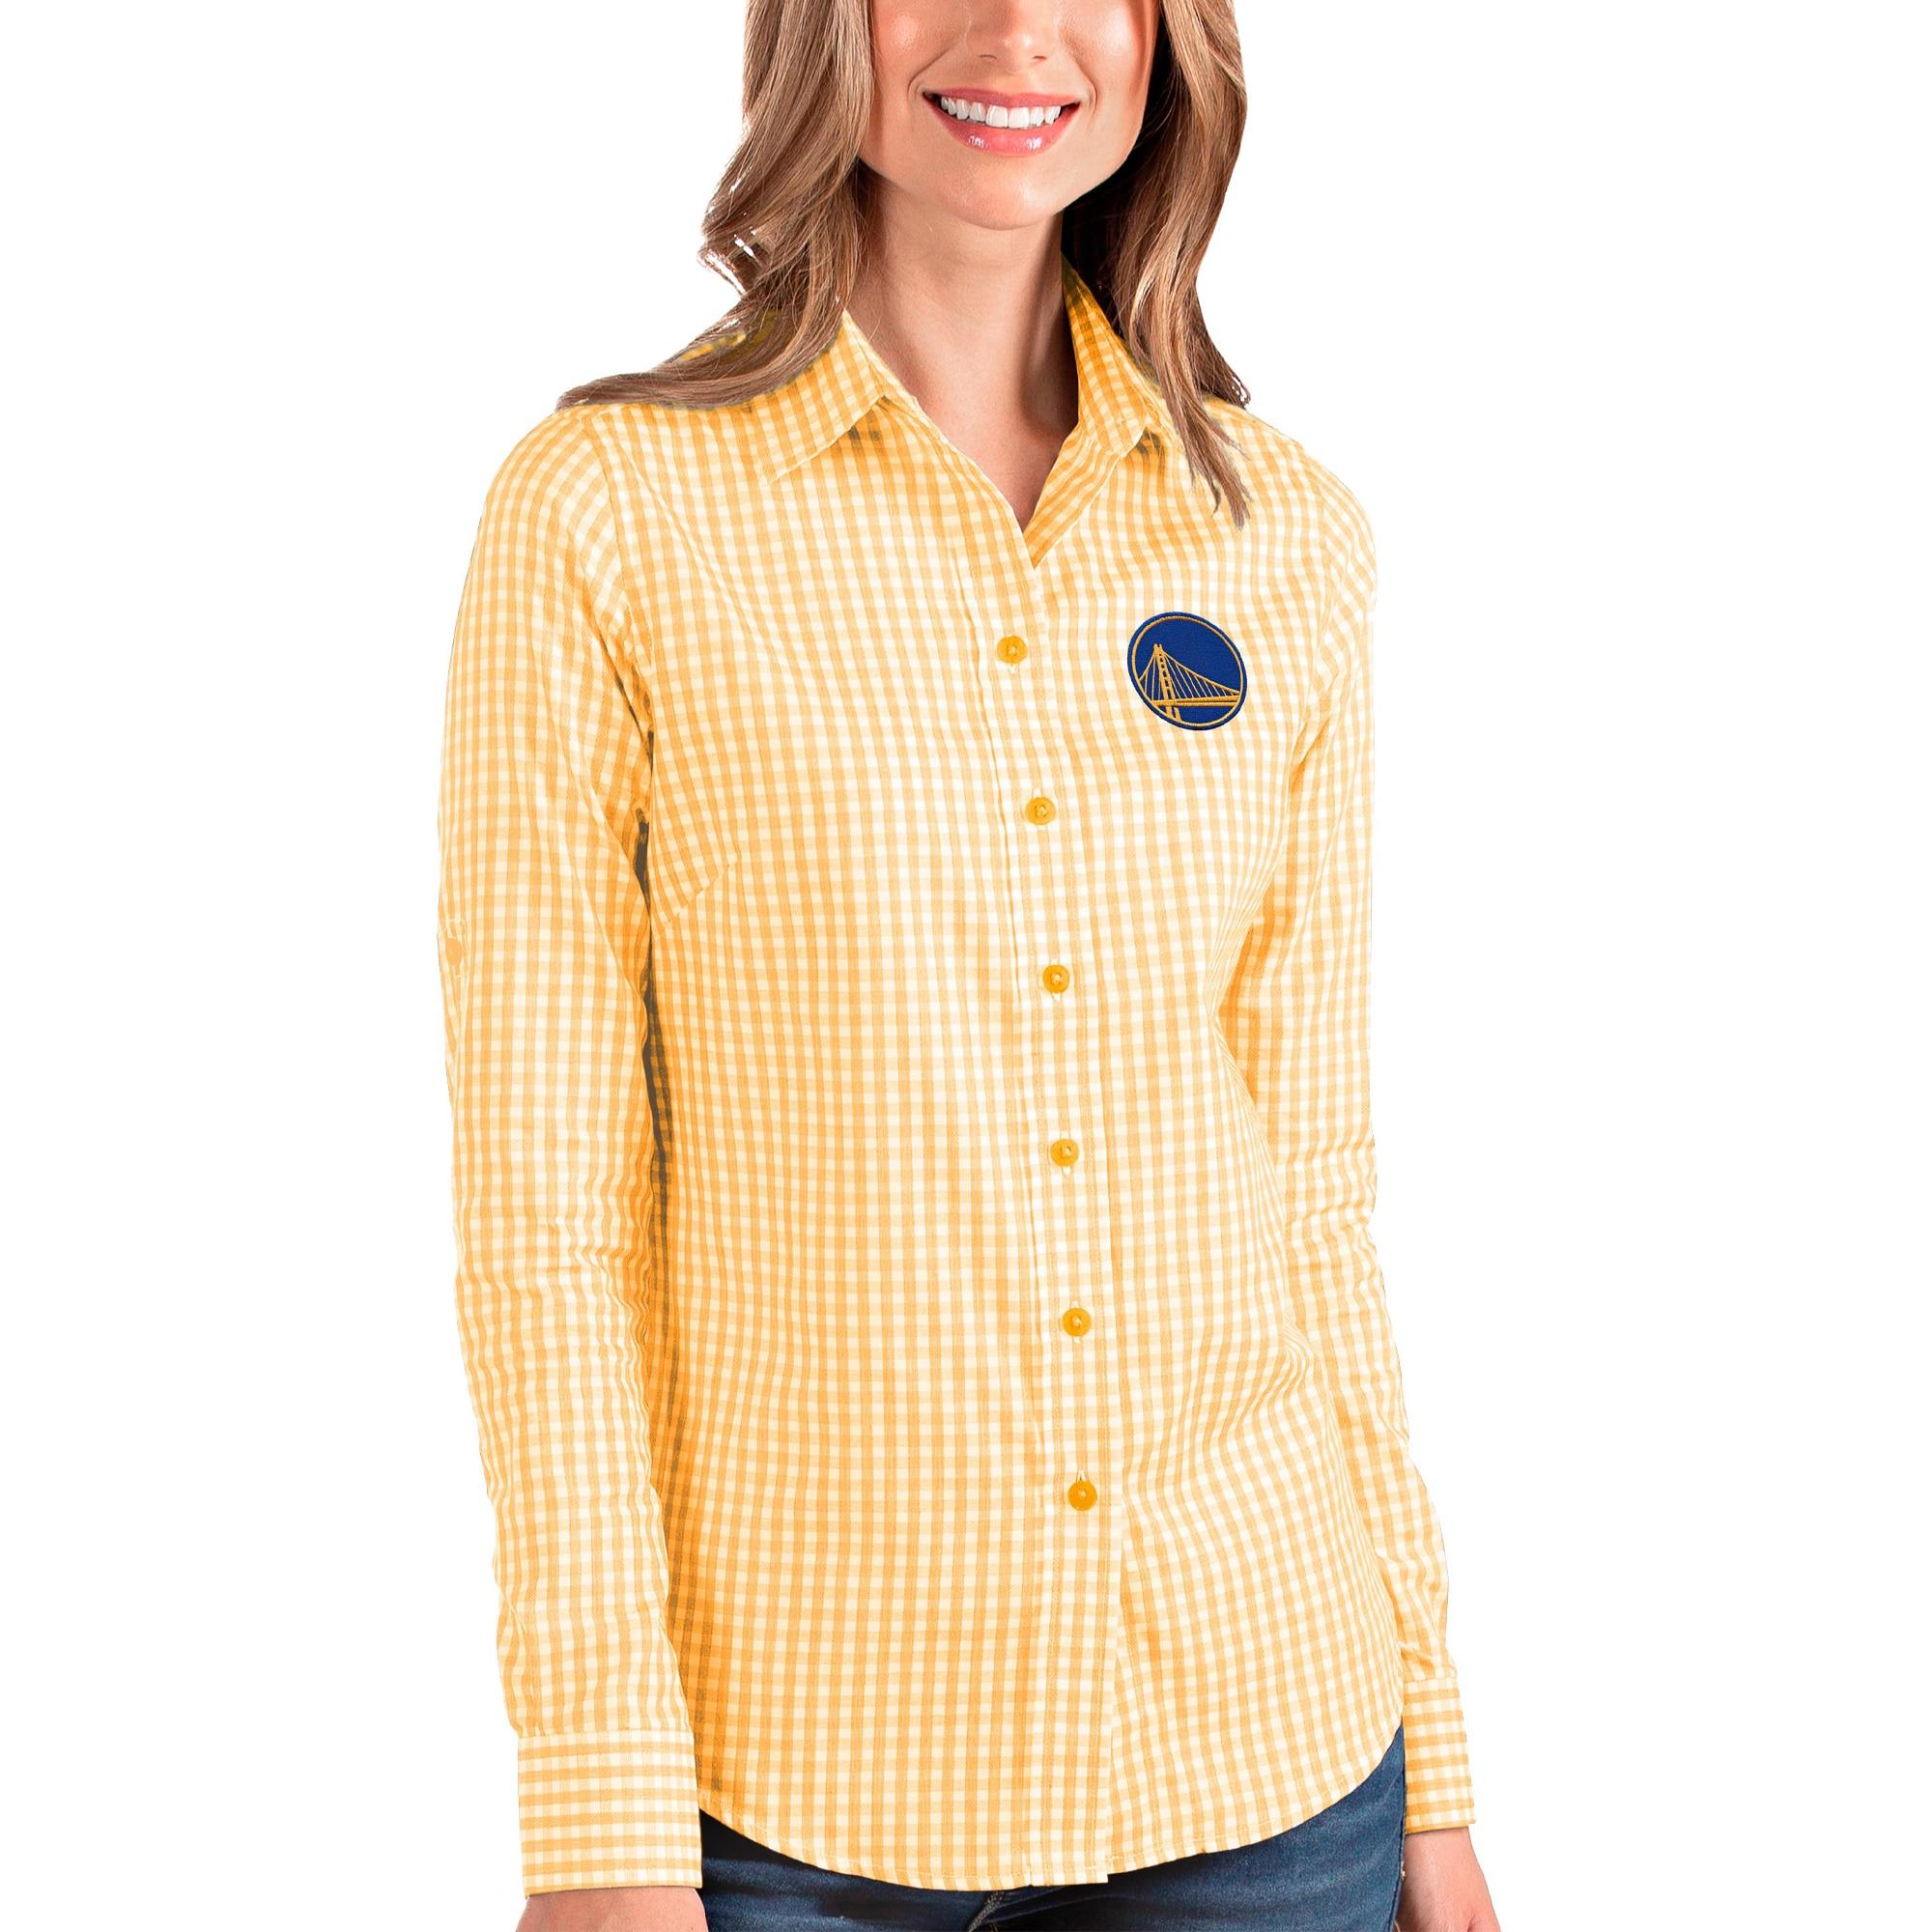 Golden State Warriors Antigua Women's Structure Button-Up Long Sleeve Shirt - Gold/White